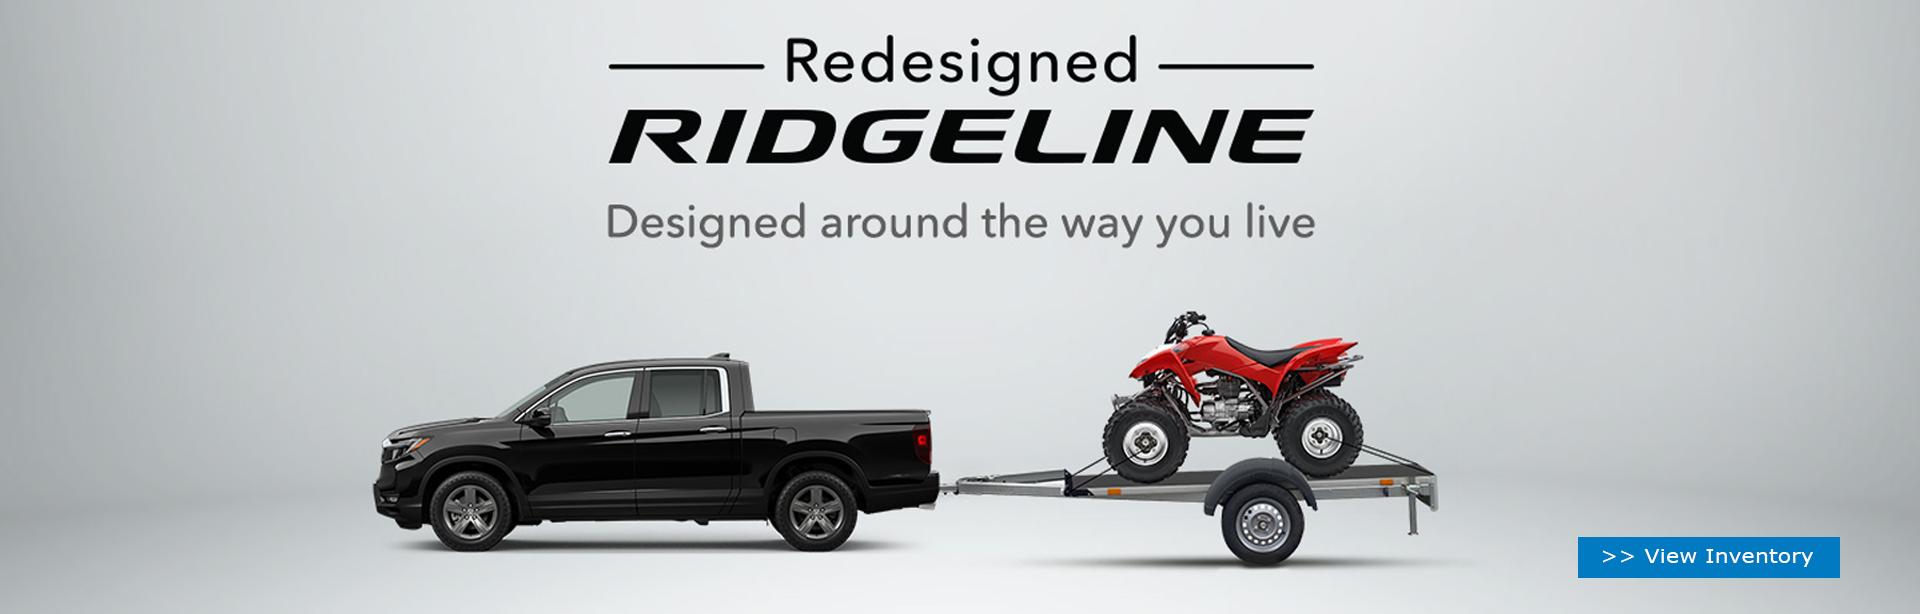 Honda-Ridgeline-Redesign-HGA